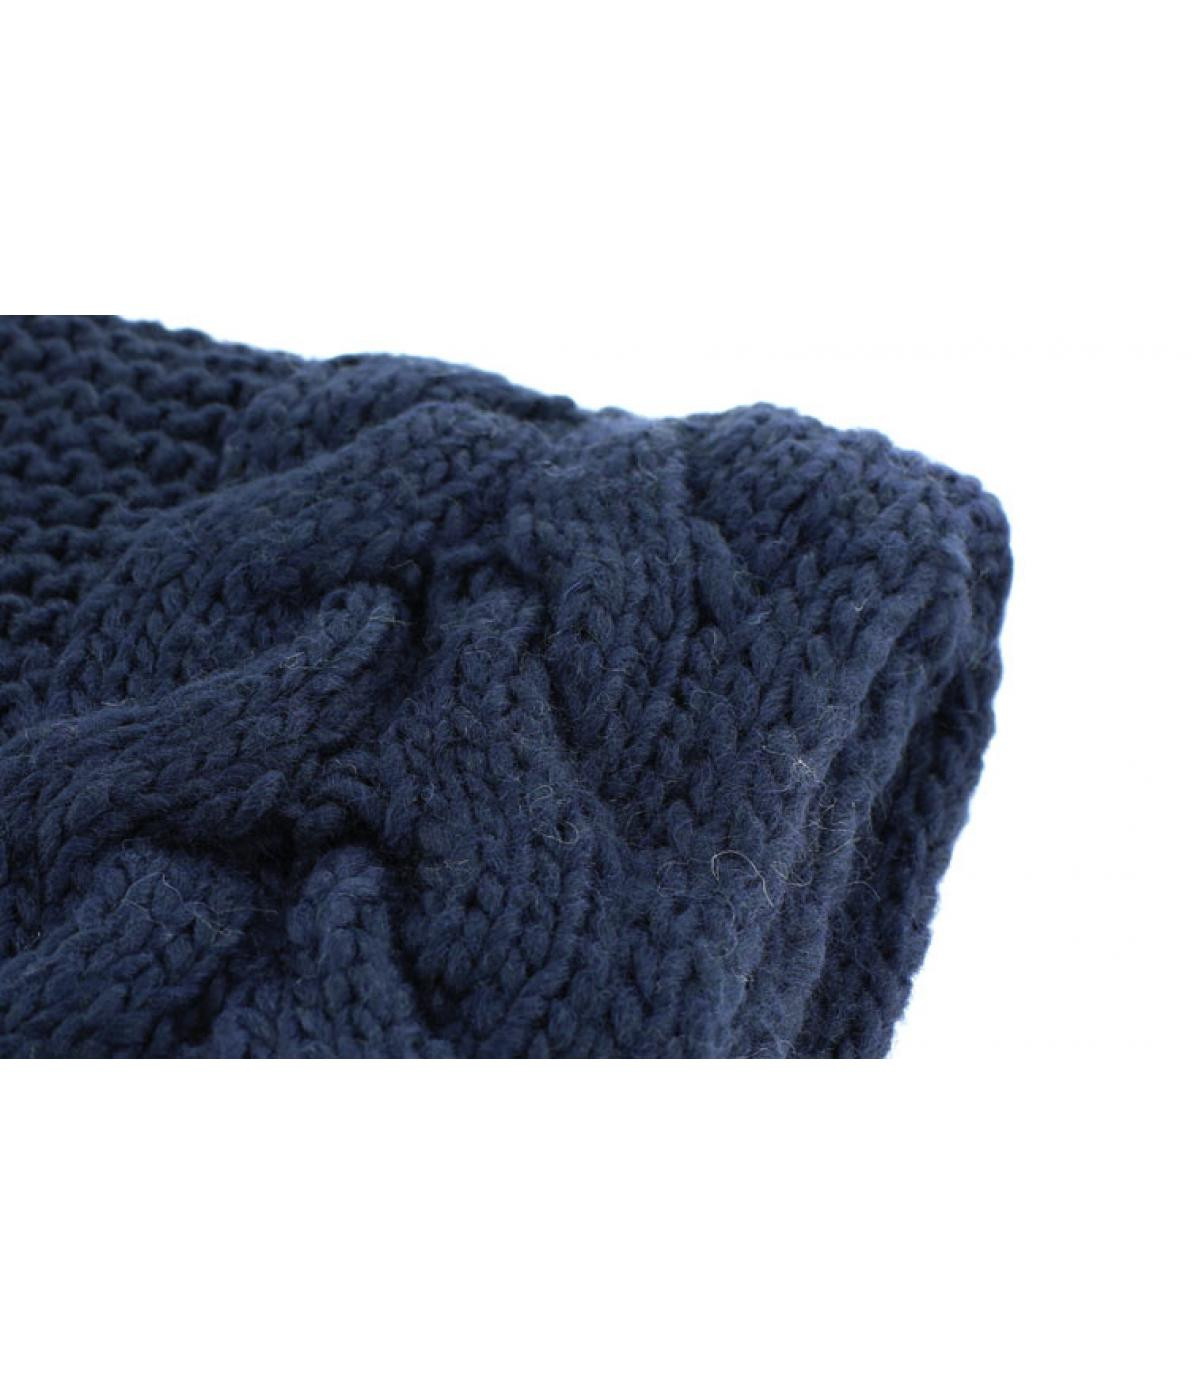 Echarpe franges bleu marine